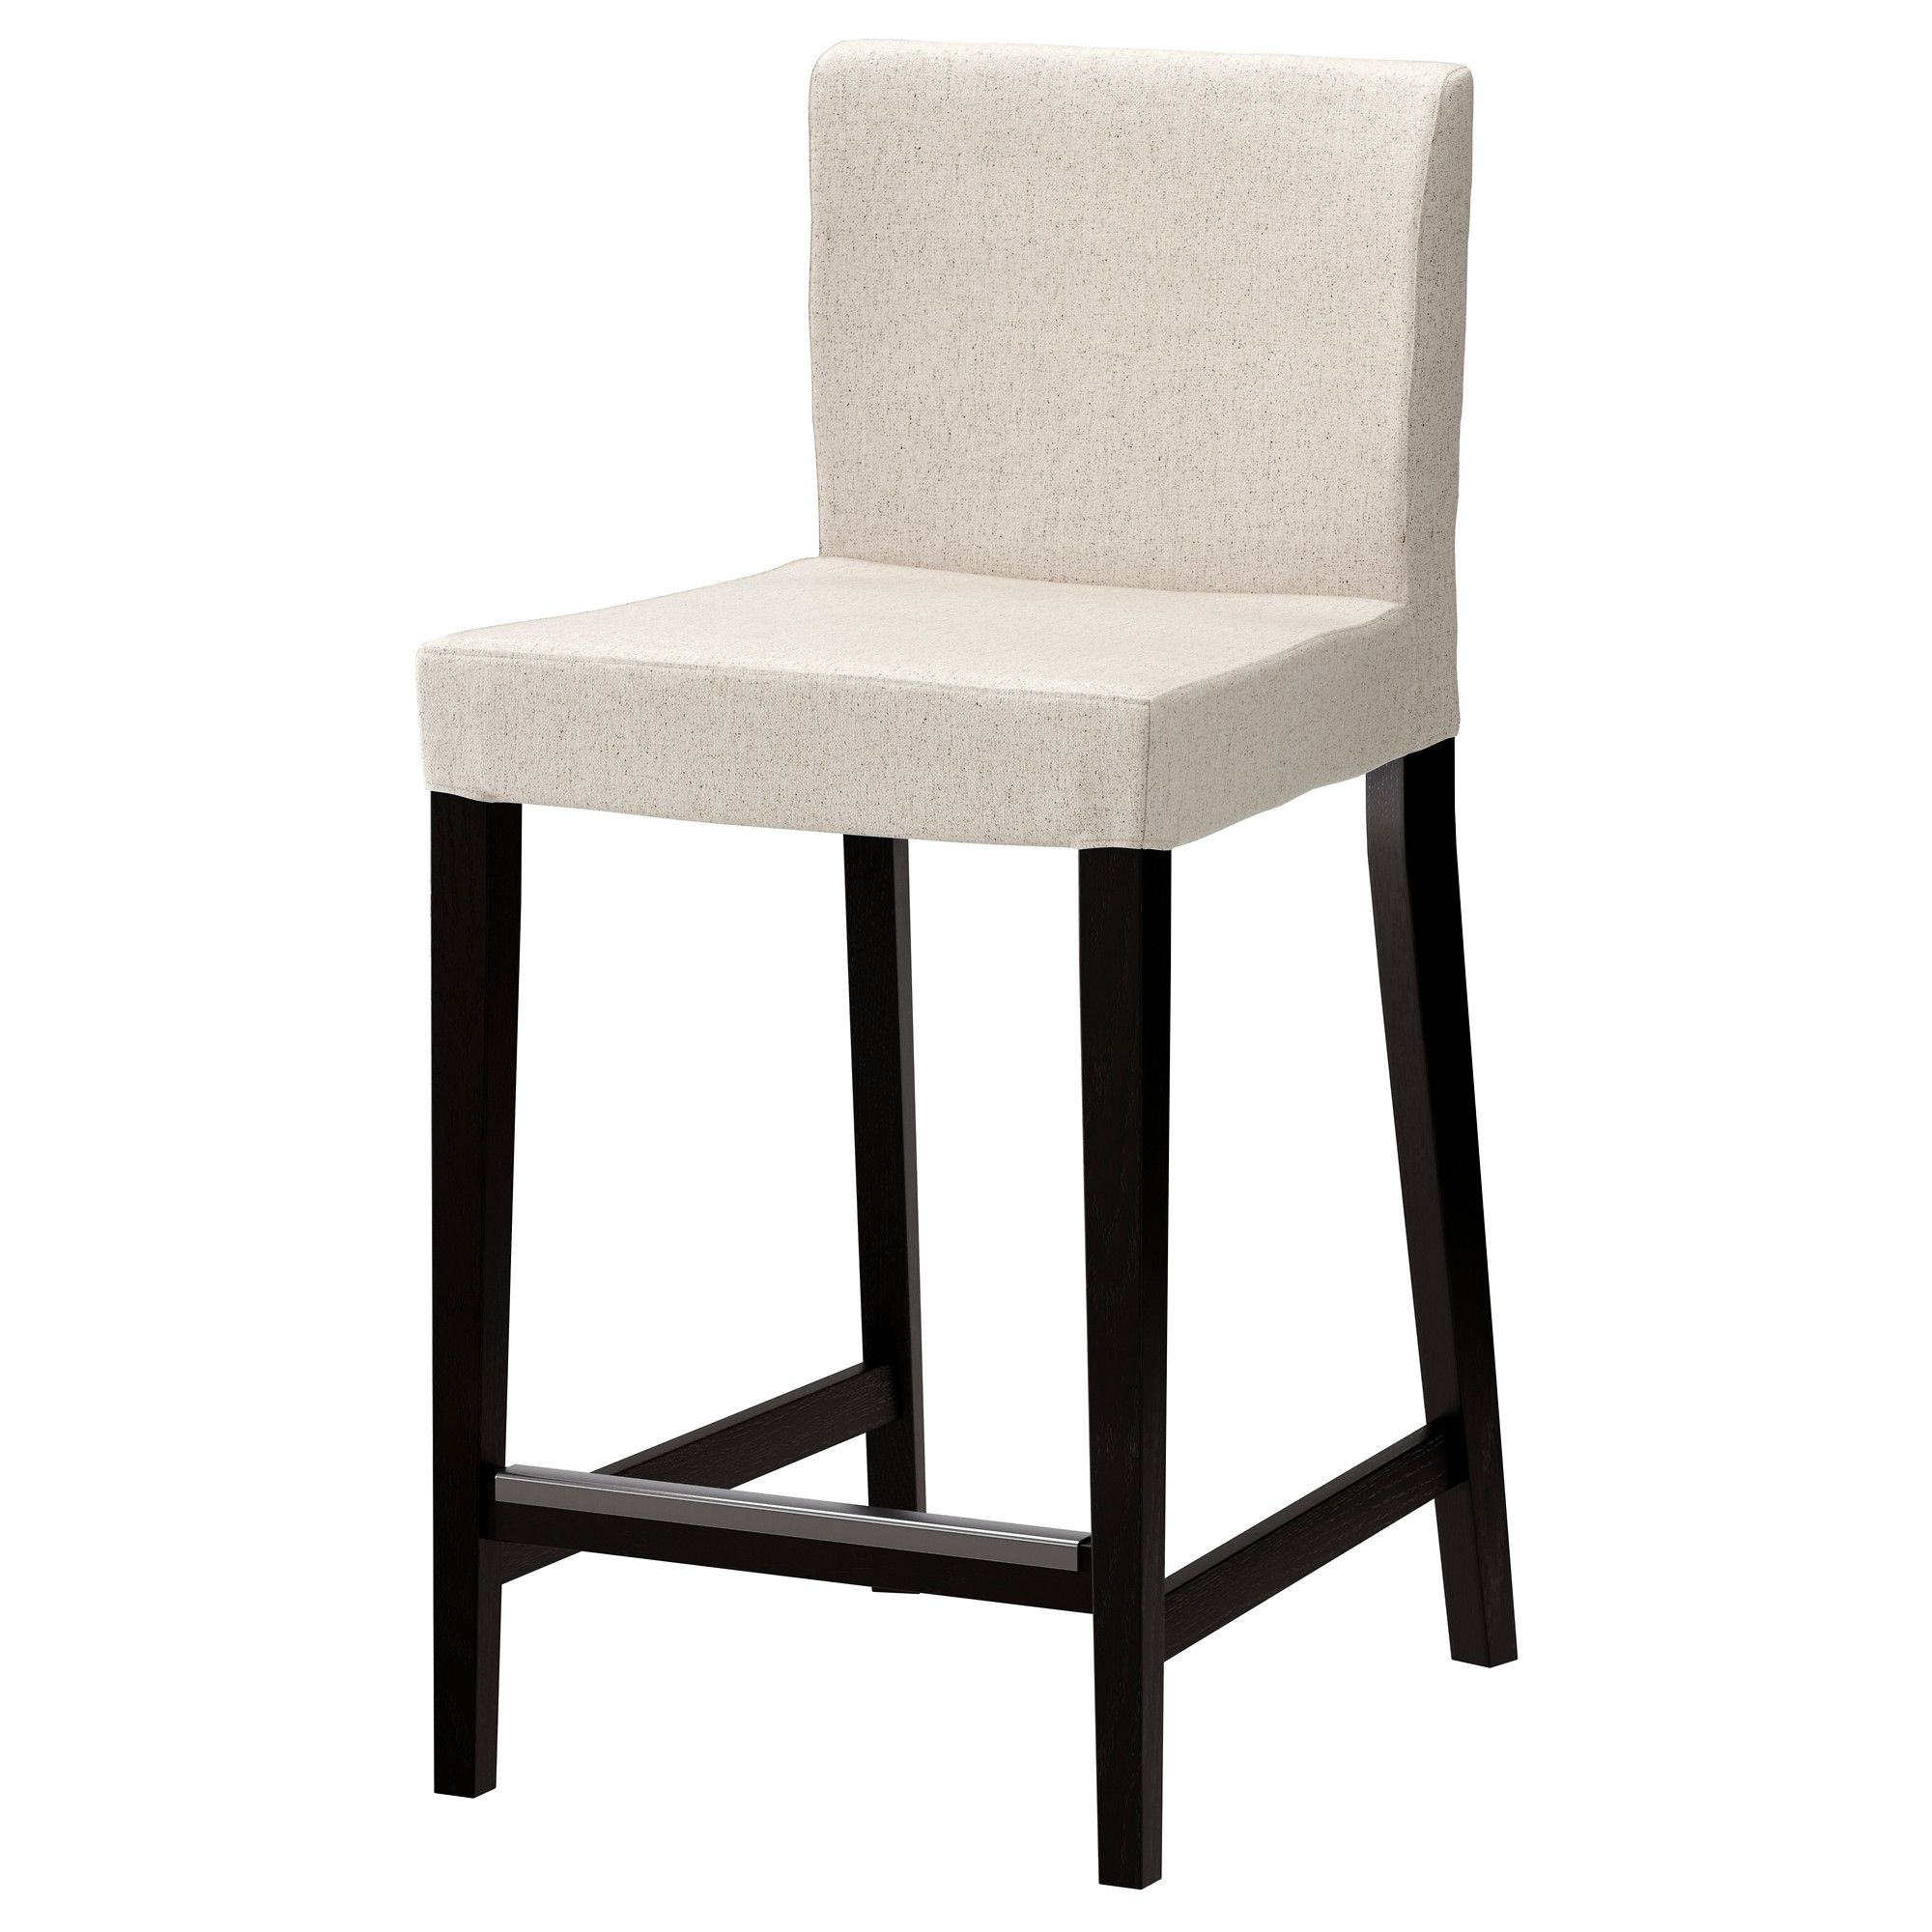 Ikea Us Furniture And Home Furnishings Bar Stool Chairs Grey Bar Stools Ikea Barstools